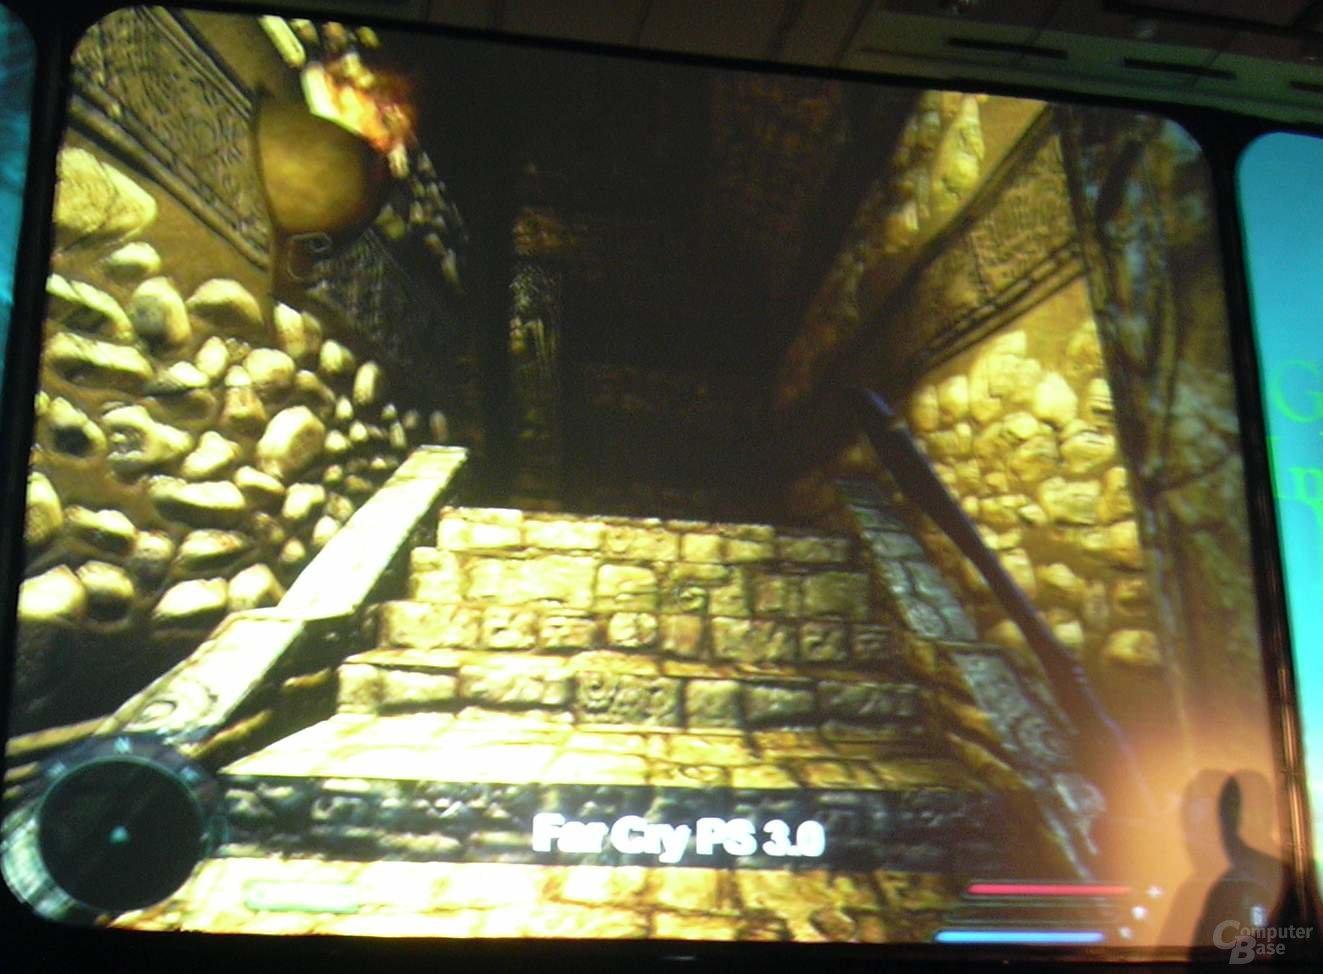 Far Cry mit Pixelshader 3.0